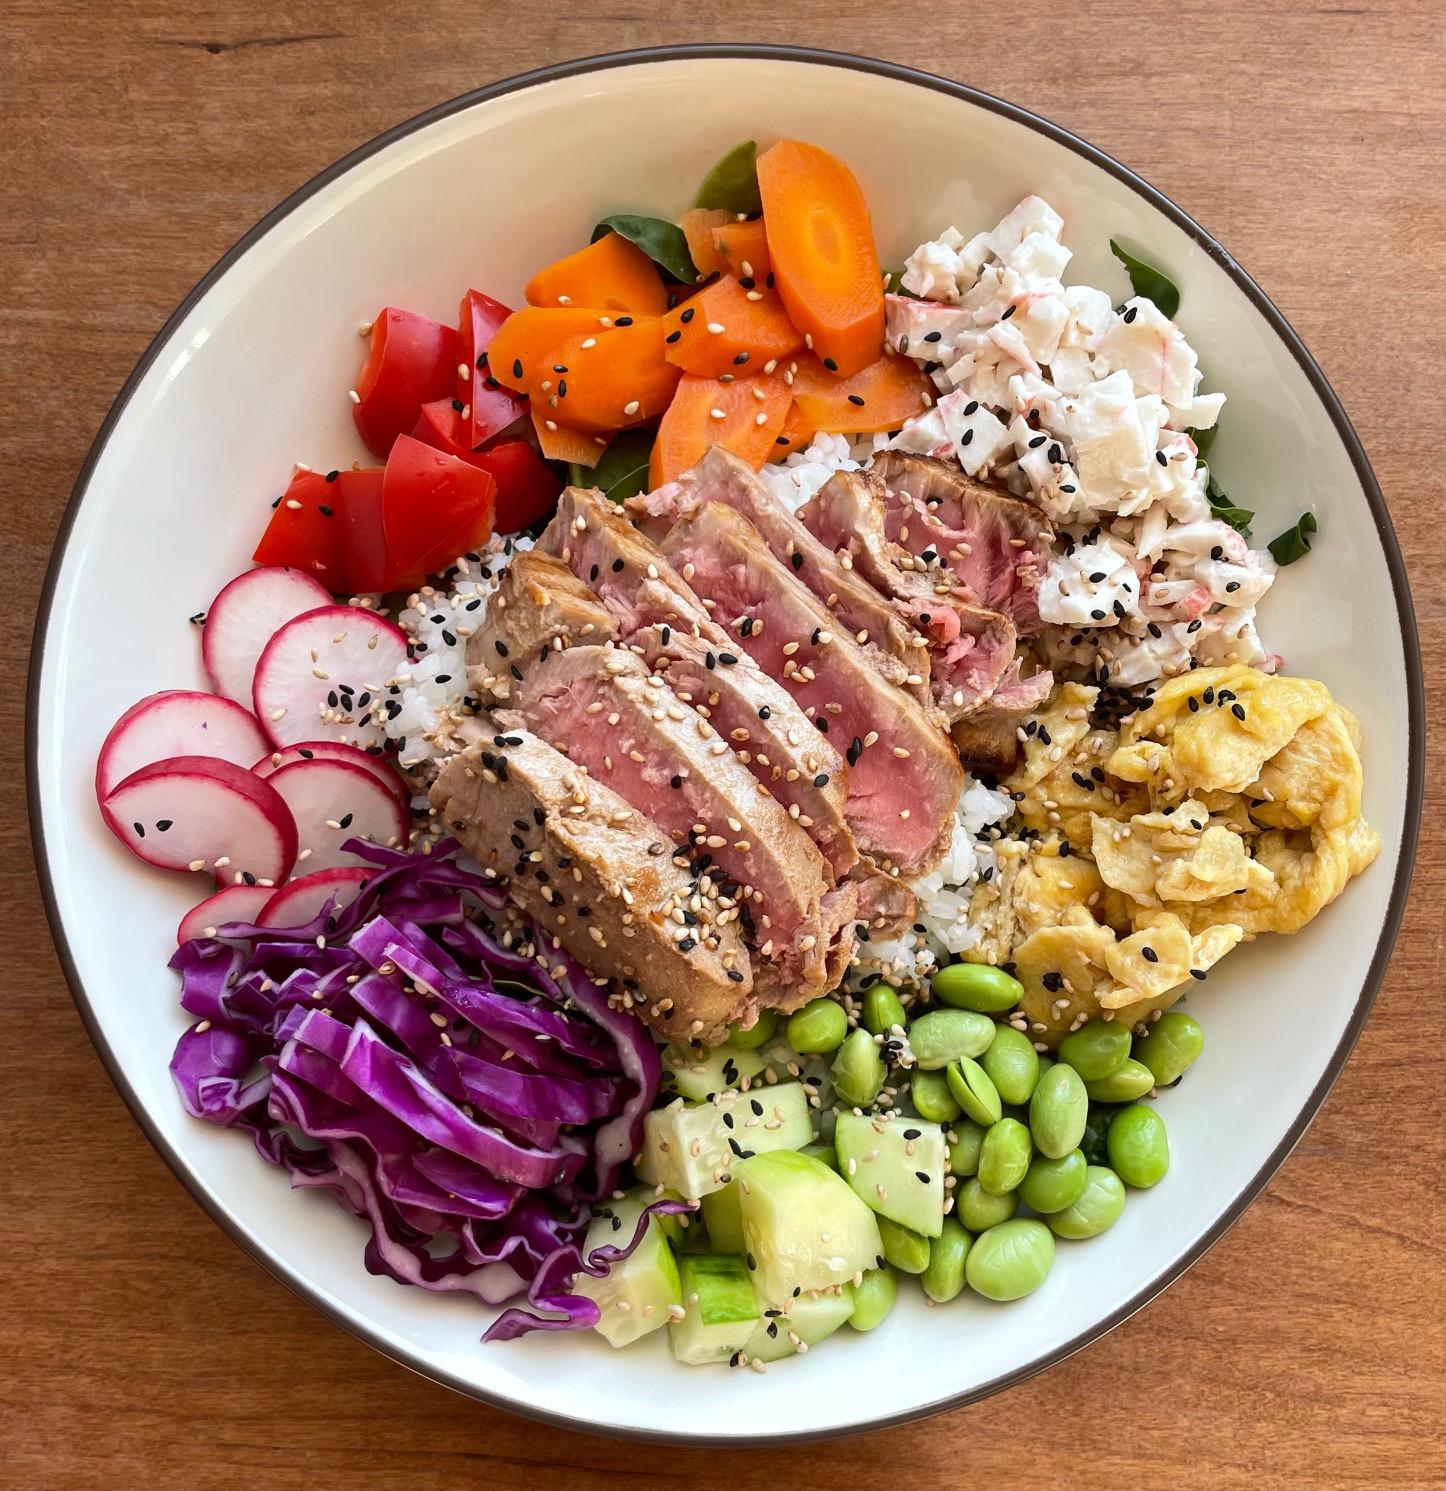 Rainbow Poke Bowl with Seared Tuna, Sushi Crab Salad, and Japanese Scrambled Eggs